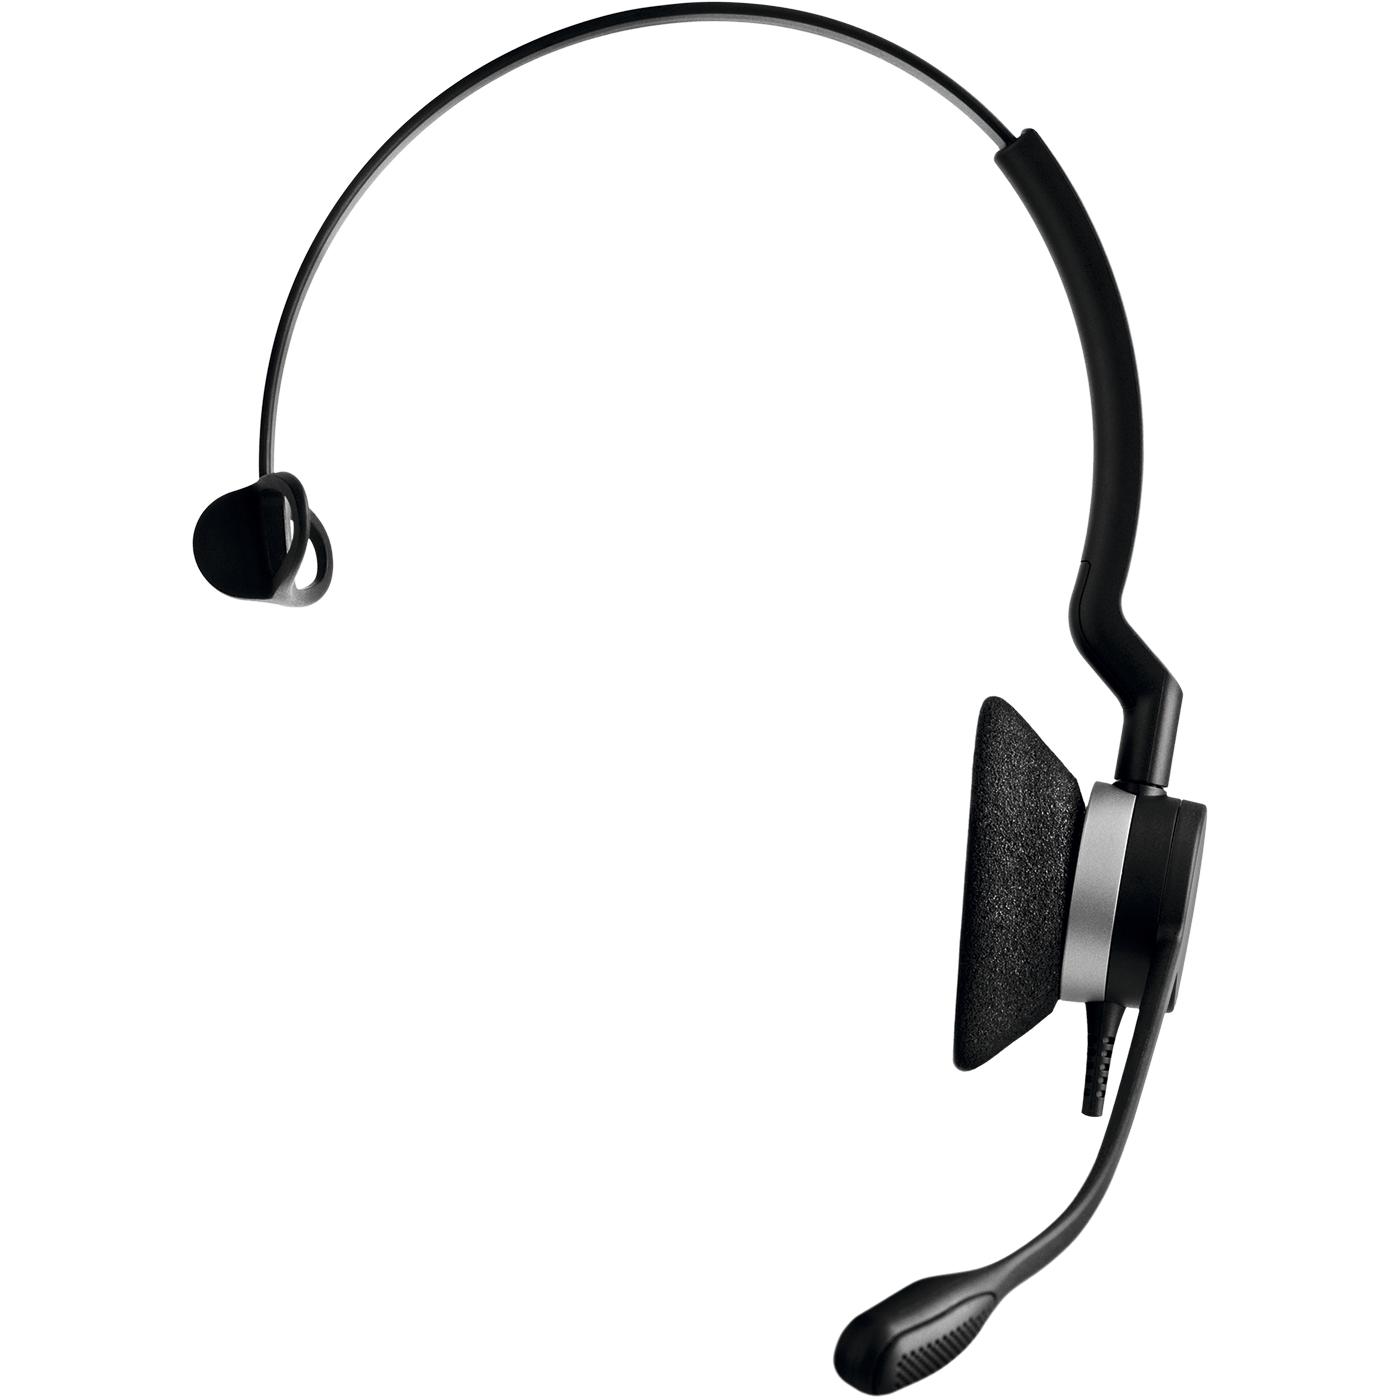 Jabra 2300 Monaural Head-band Black